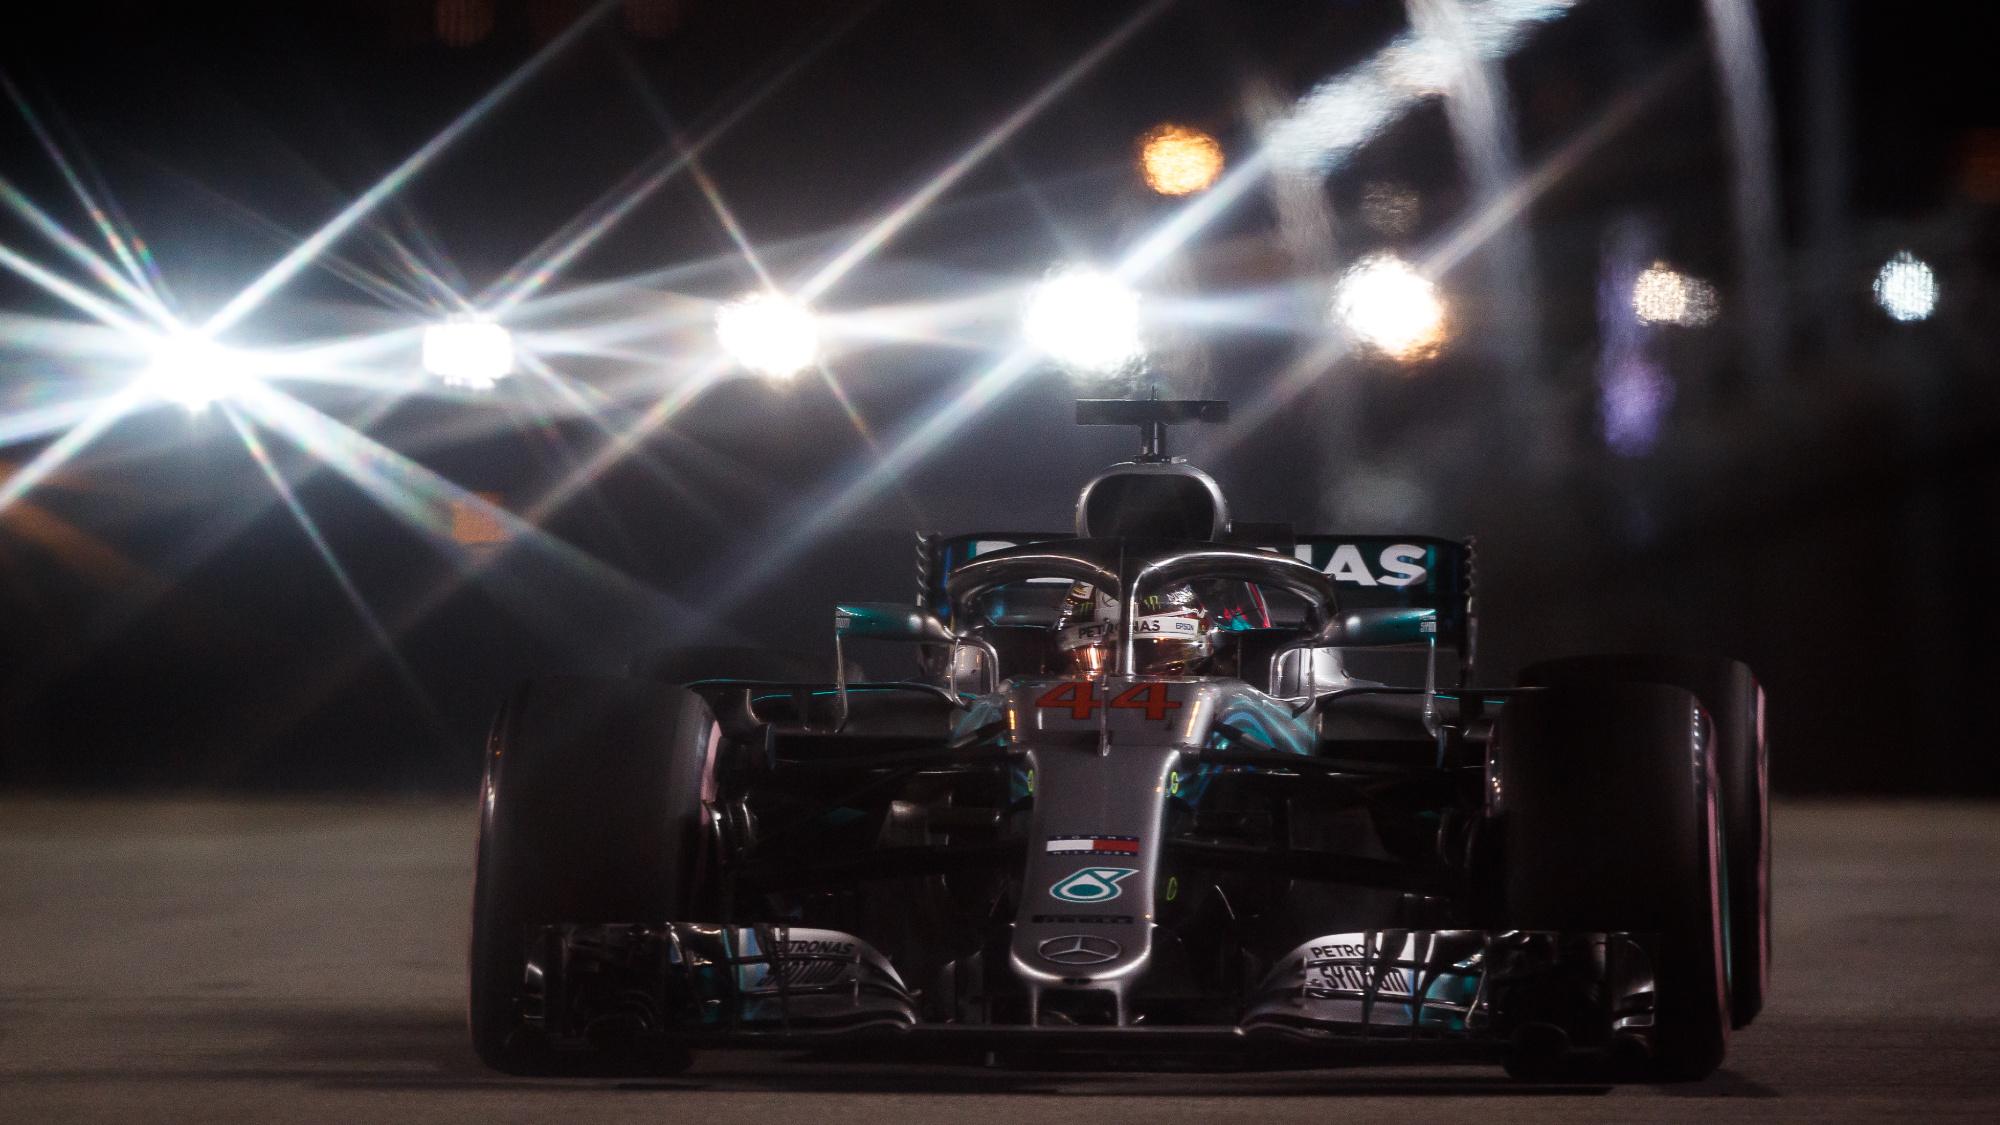 Lewis Hamilton, 2018 Singapore Grand Prix